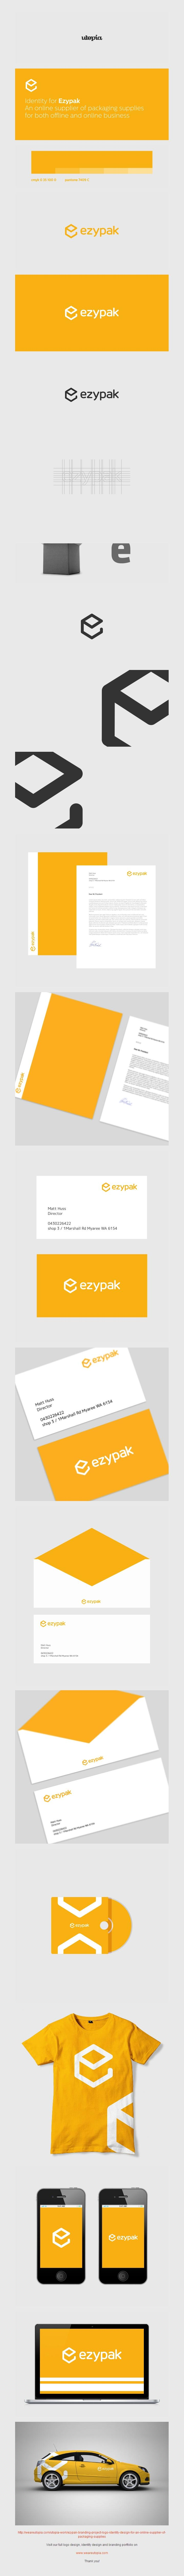 Ezypak logo and corporate identity design by Utopia Branding Agency2